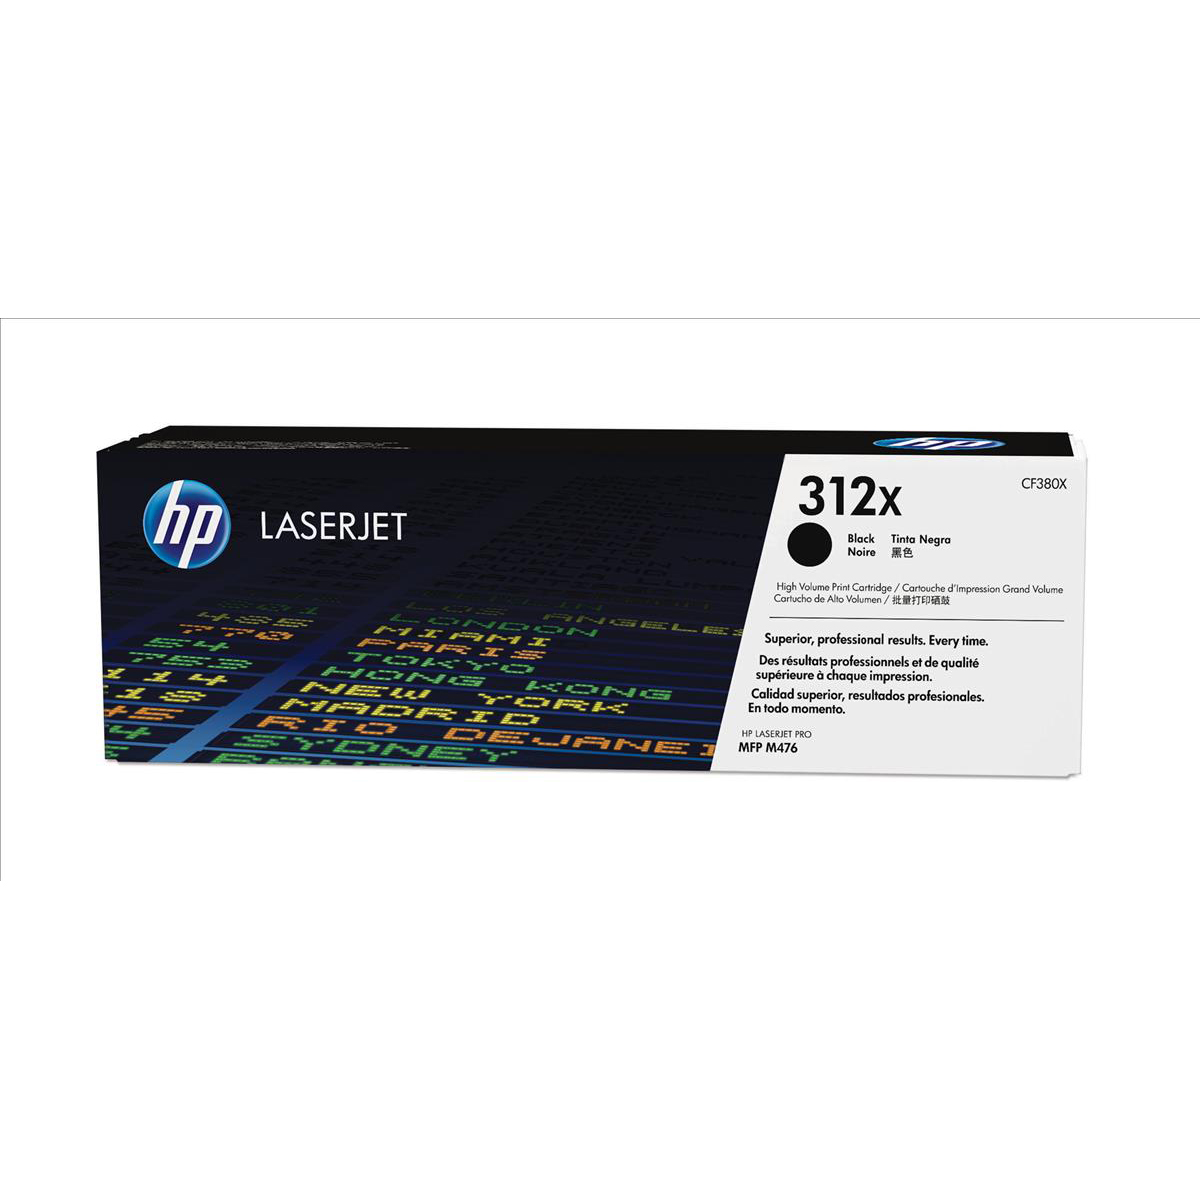 Hewlett Packard [HP] 312X Laser Toner Cartridge High Yield Page Life 4400 Black Ref CF380X